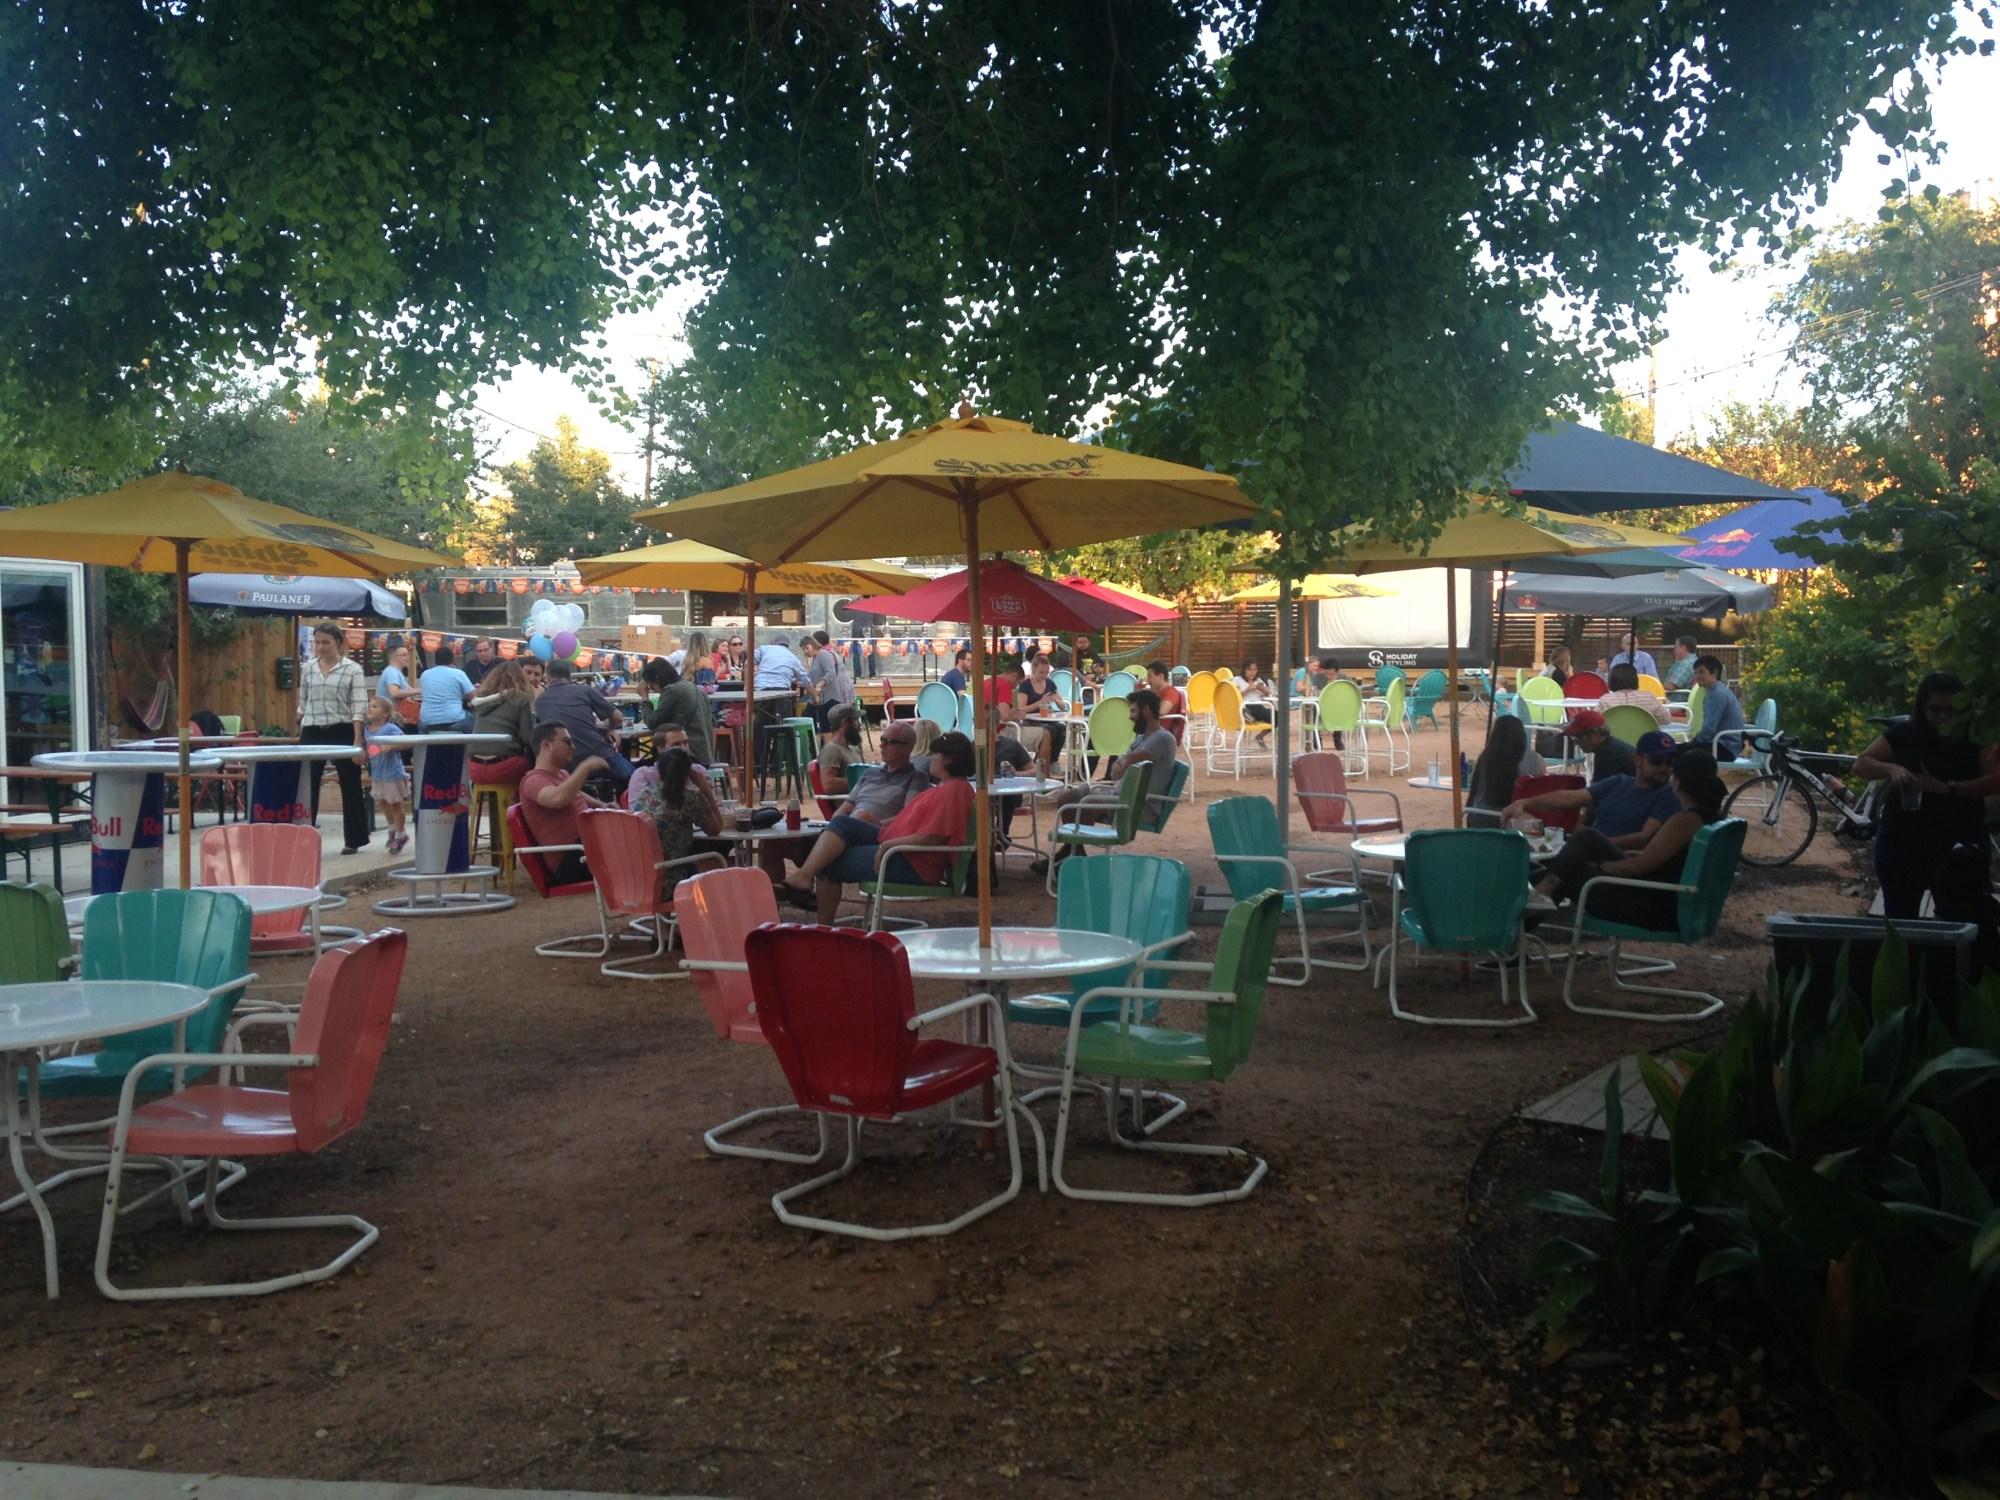 Photo of the Burleson Yard Beer Garden in San Antonio, Texas.